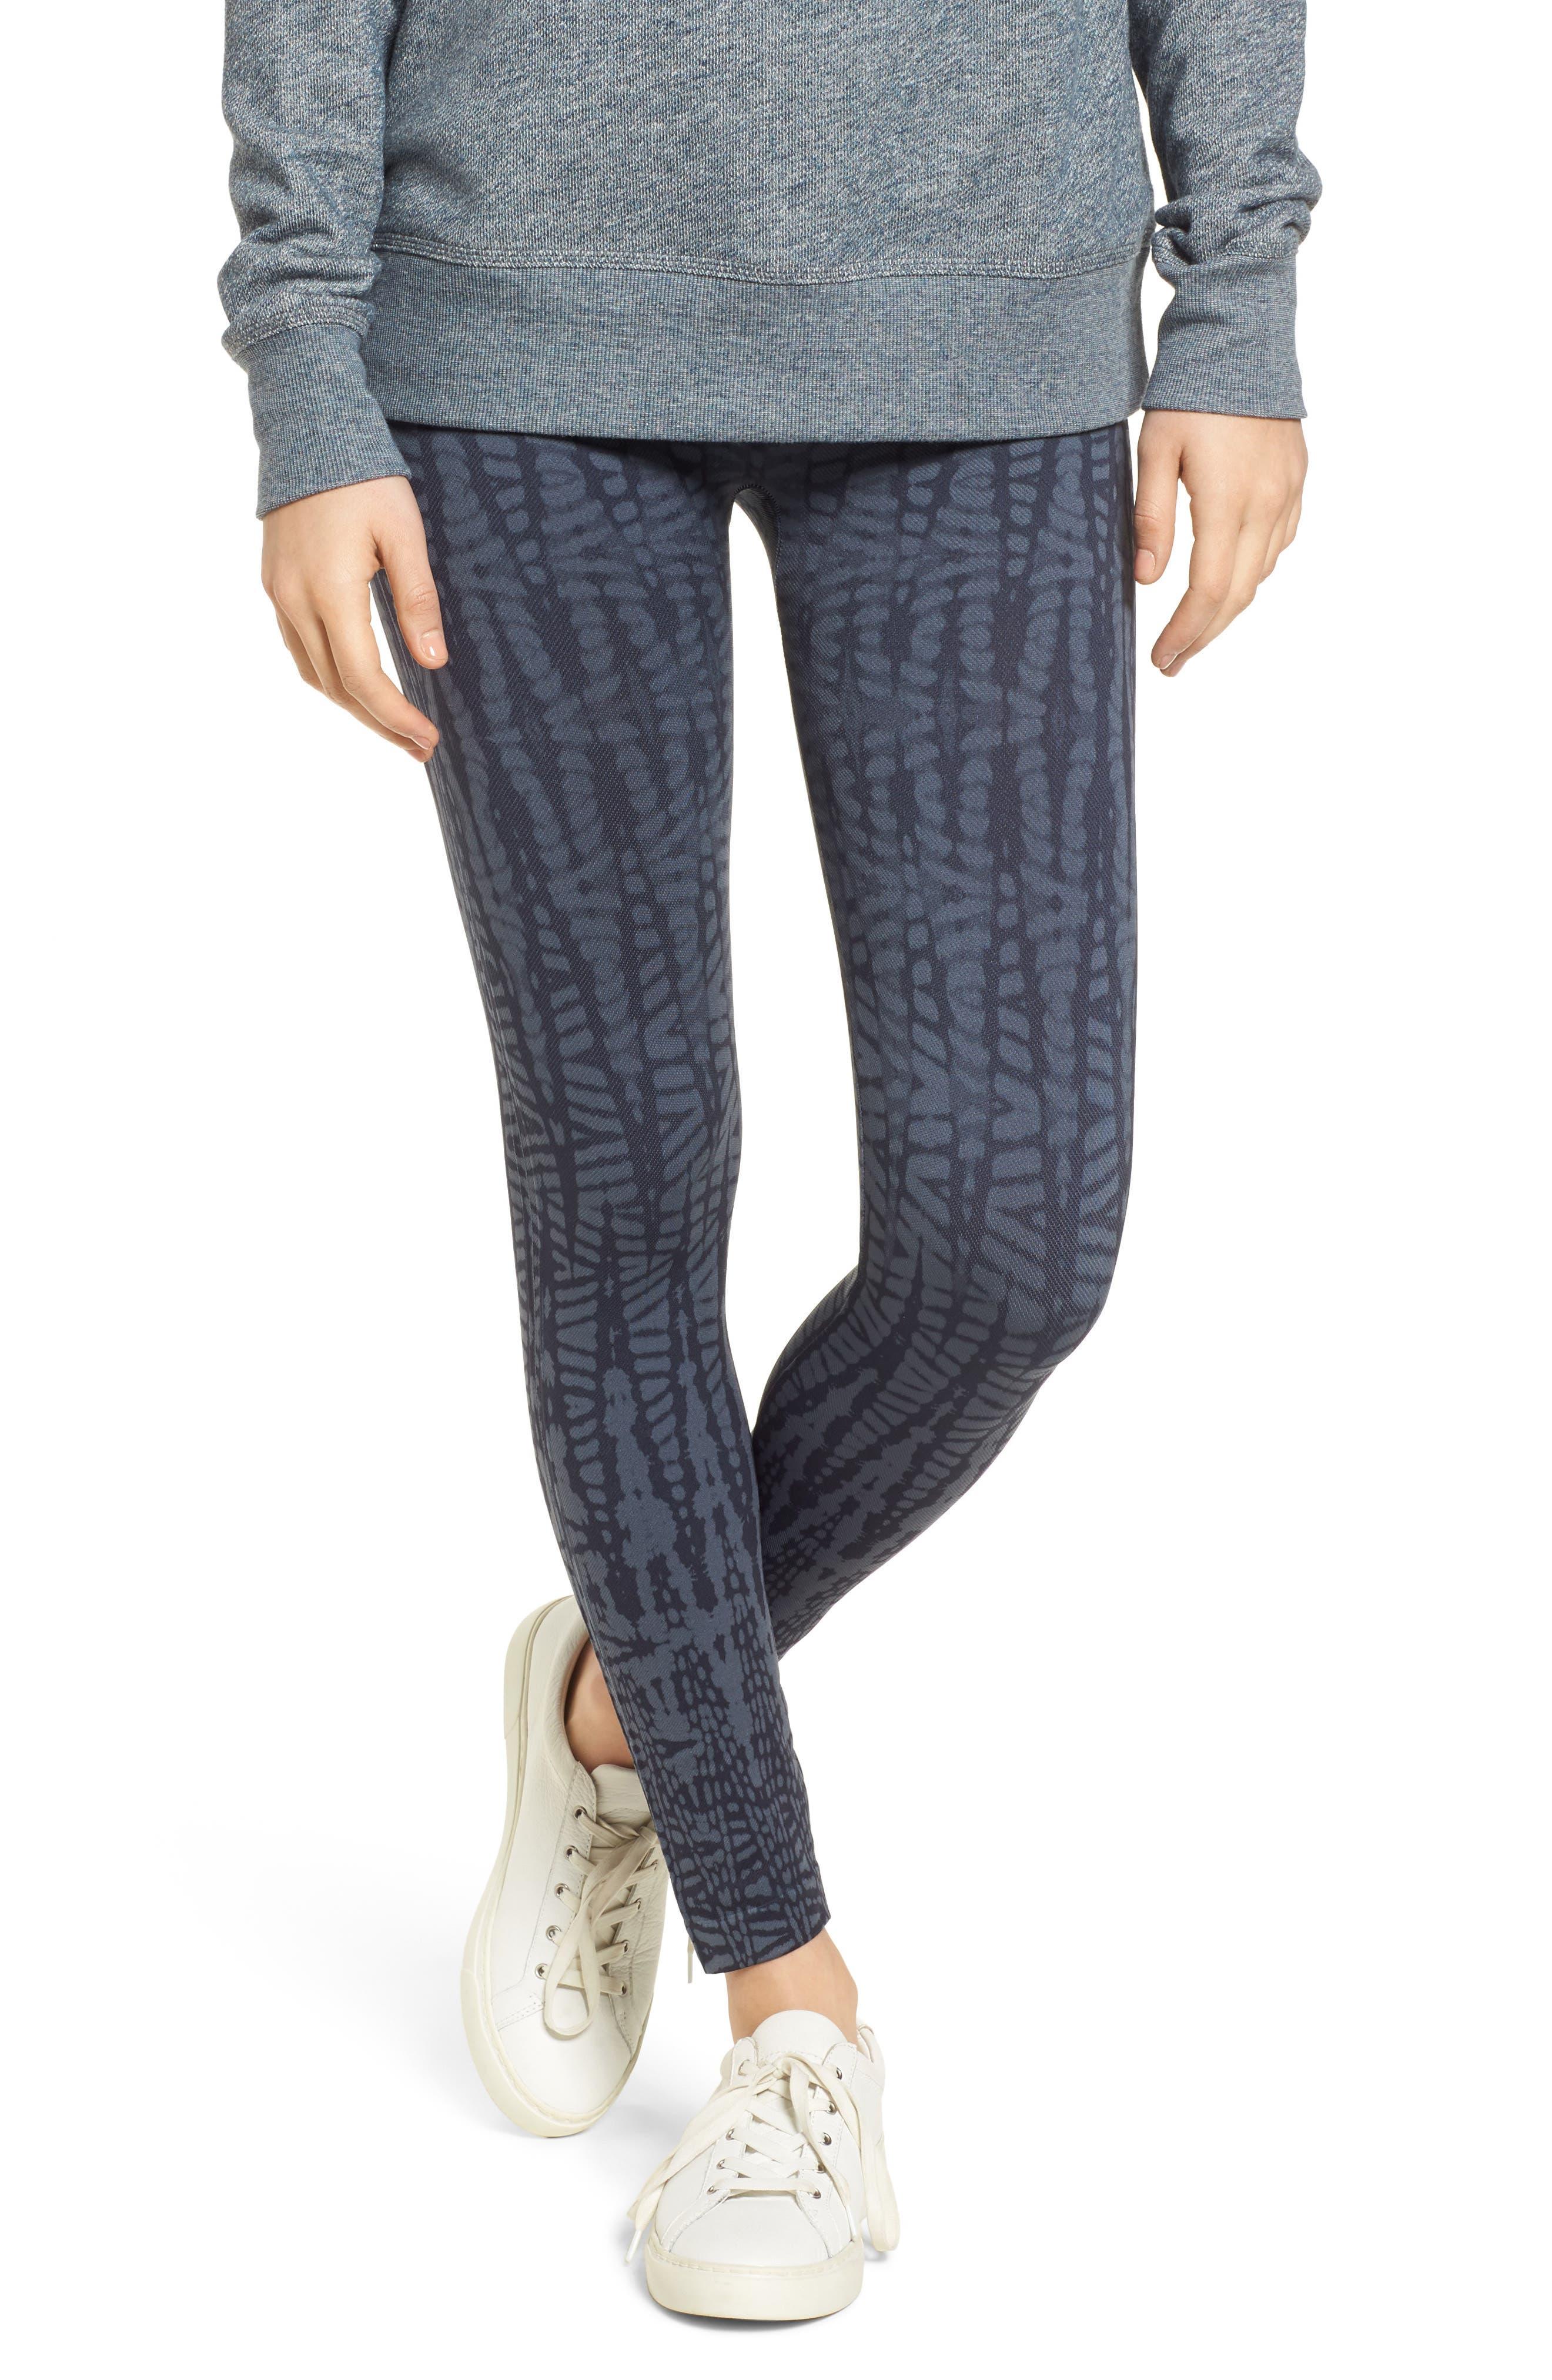 Alternate Image 1 Selected - SPANX® Look at Me Now' Seamless Leggings